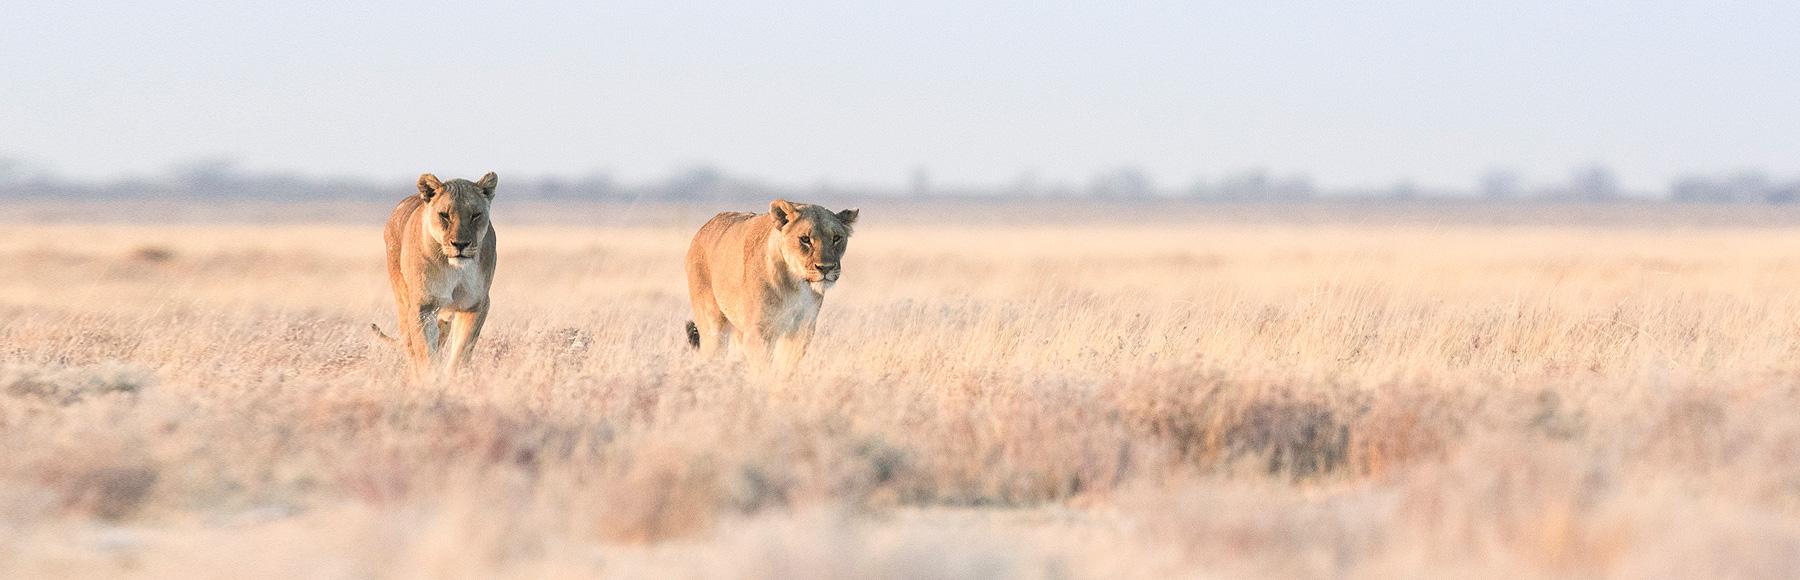 Lions in Etosha National Park